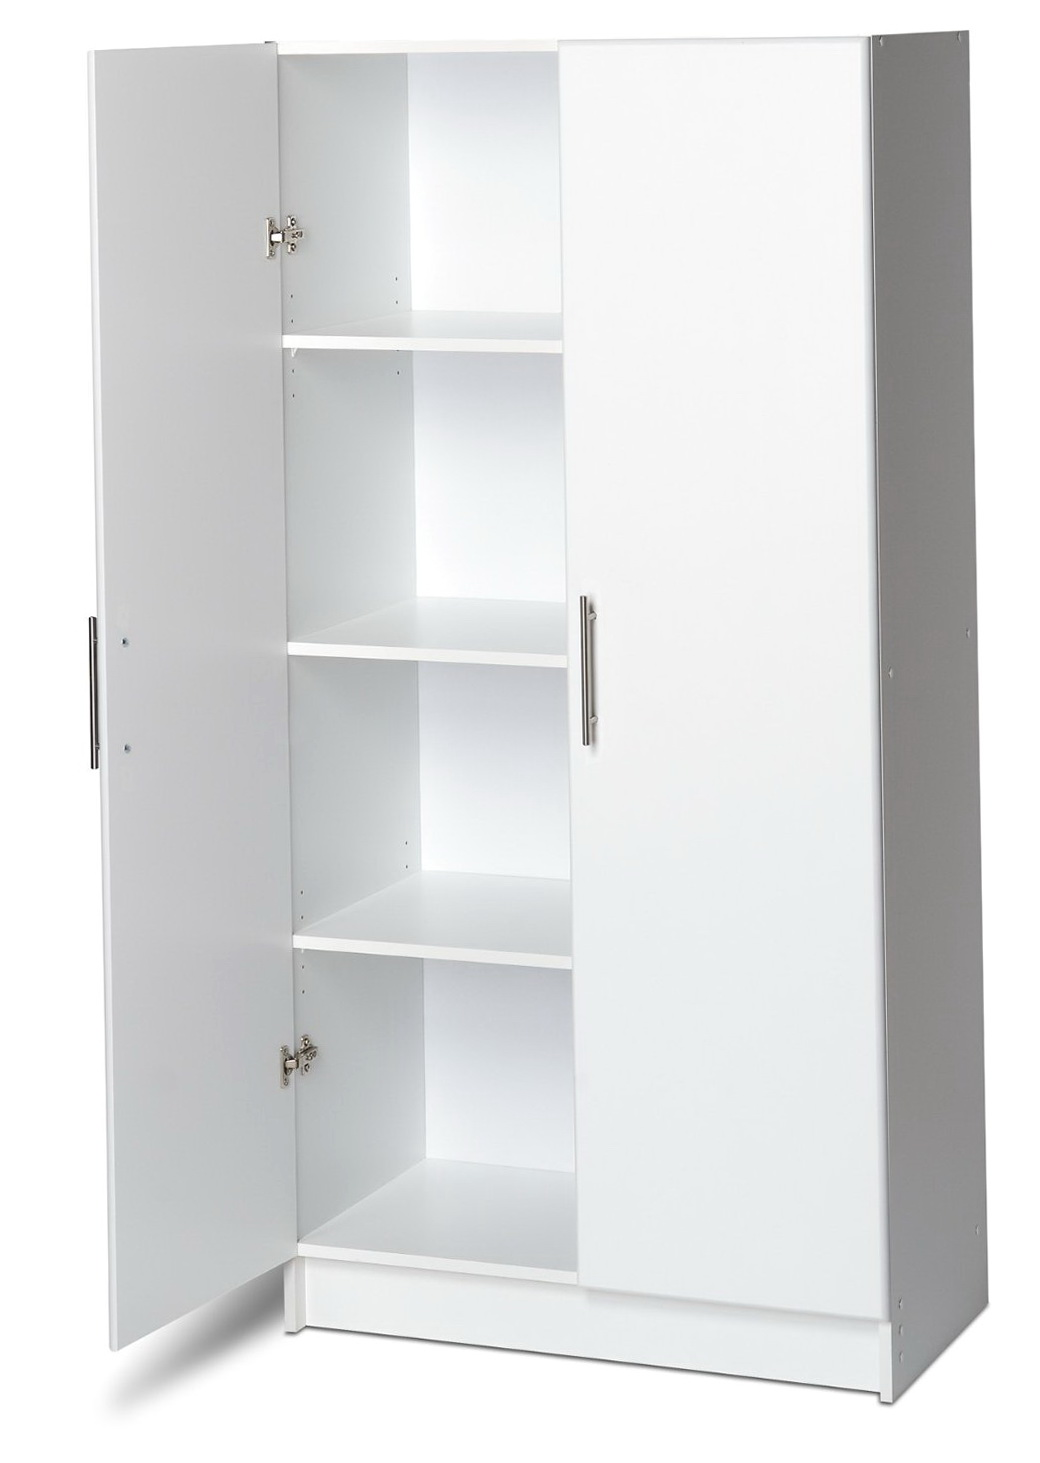 Free Standing Broom Closet Cabinet Home Design Ideas